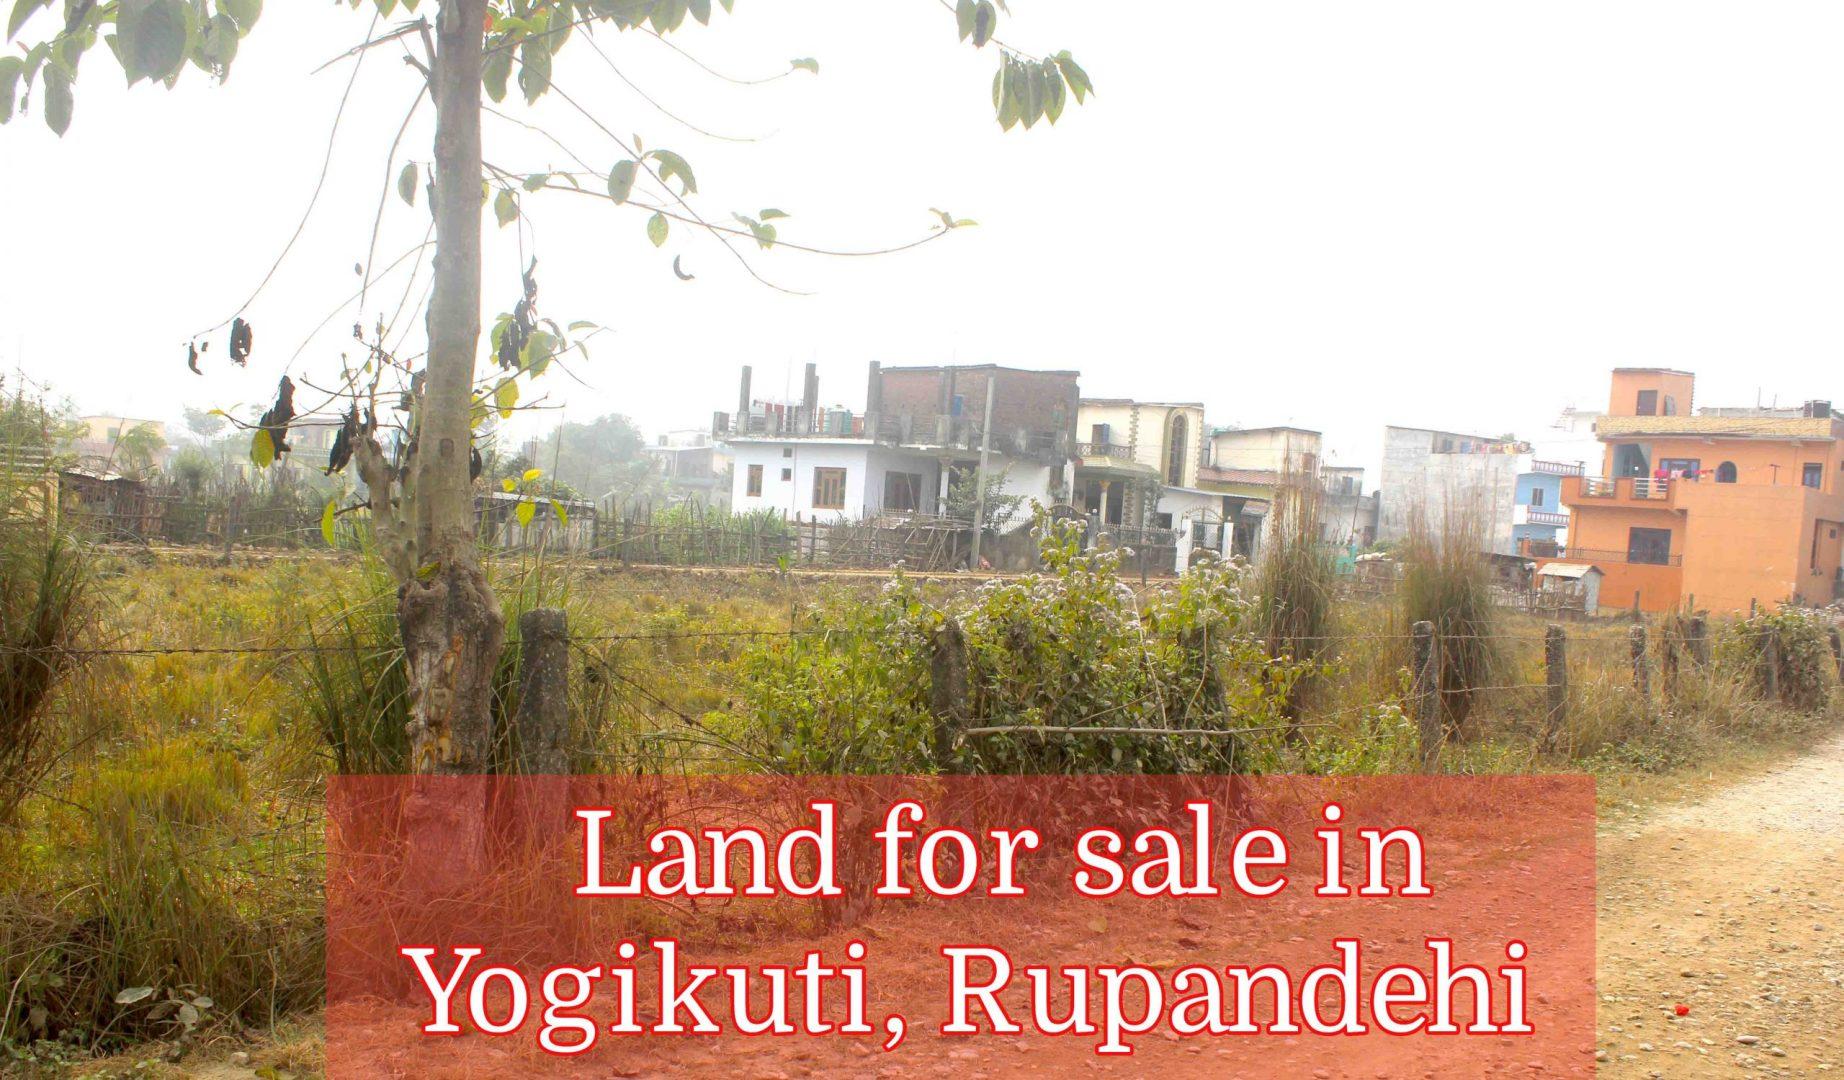 Cheap lands are for sale in Tilottama Rupandehi